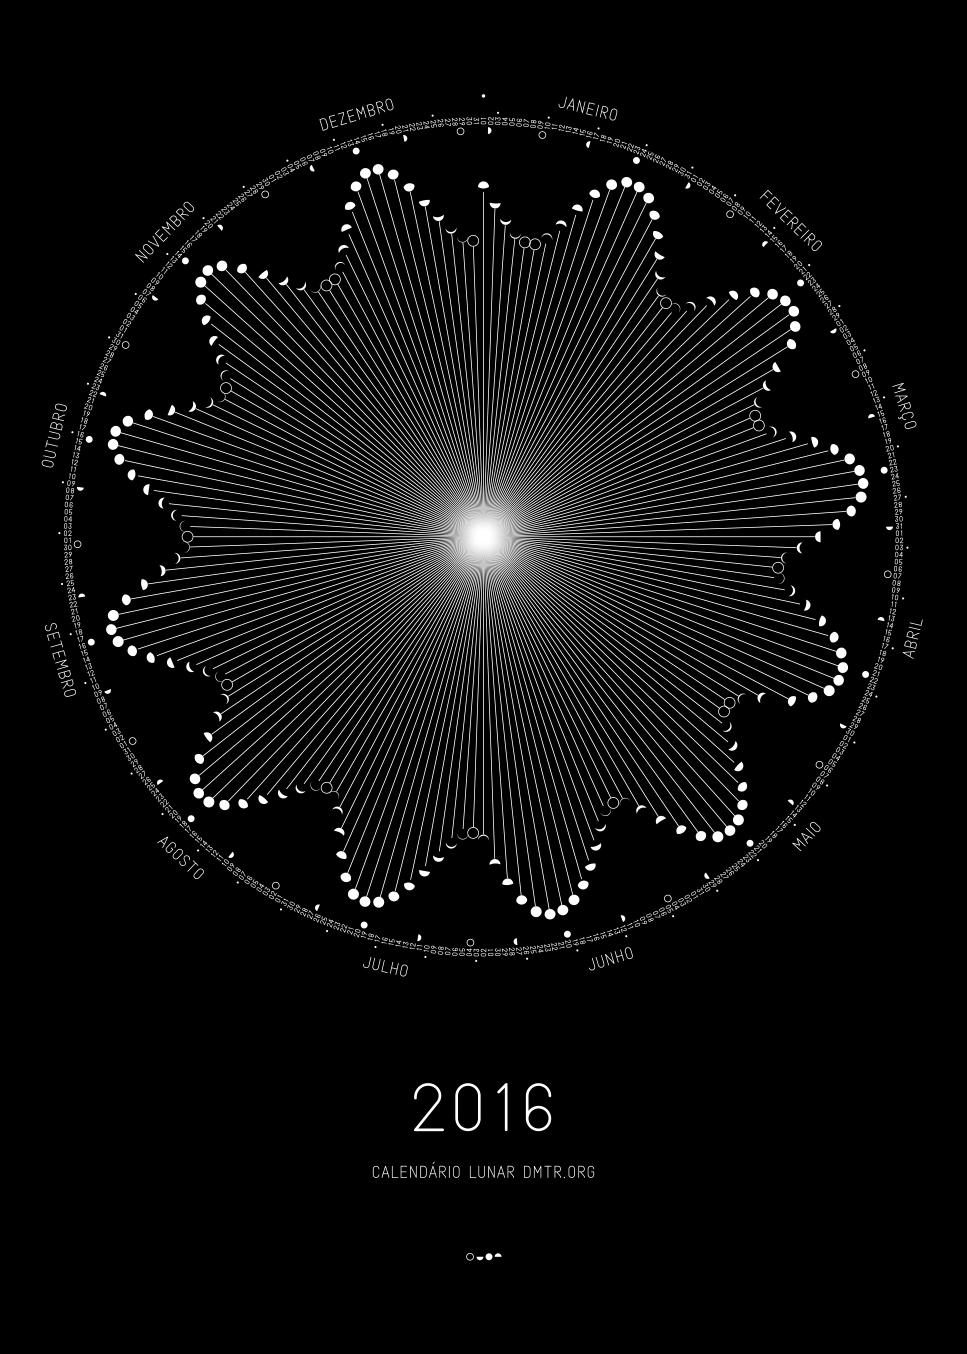 lunar2016_dmtr.org.jpg